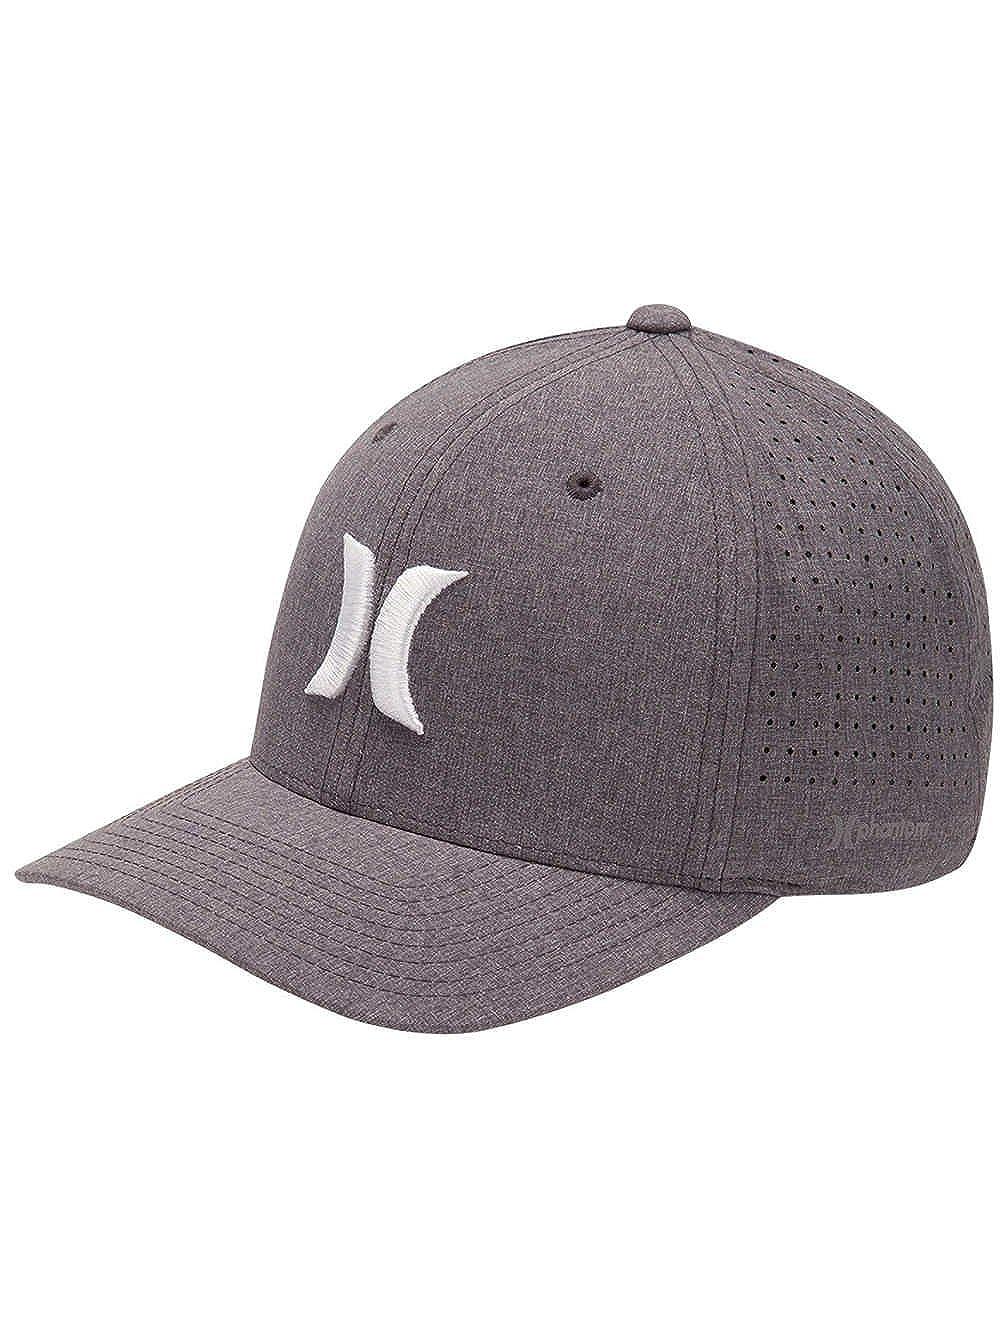 Hurley Phantom 4.0 Cap